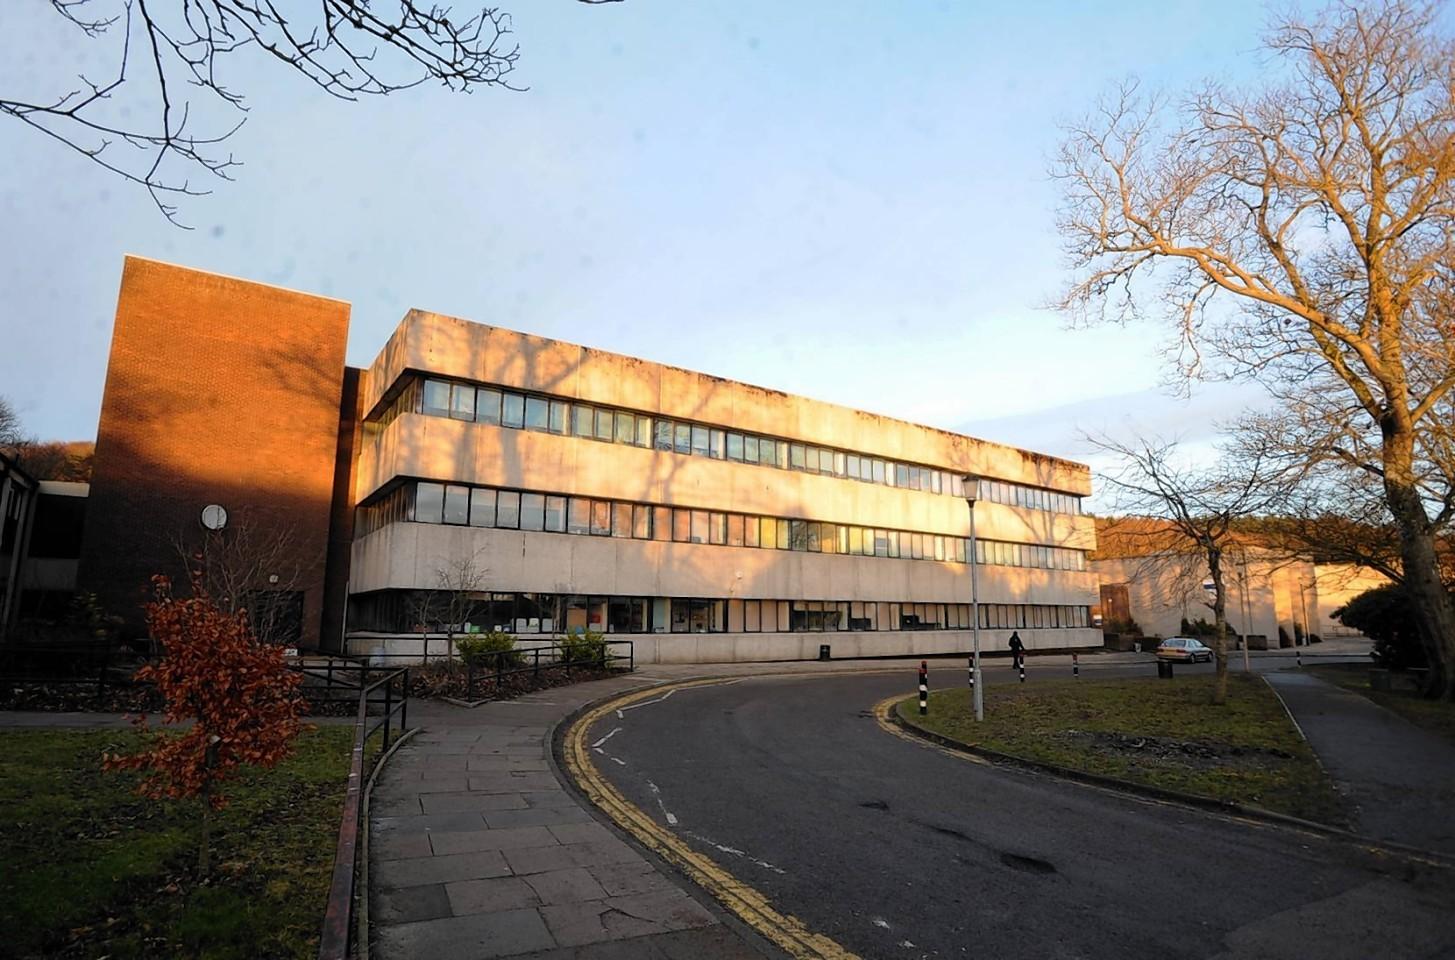 The former Ellon Academy site